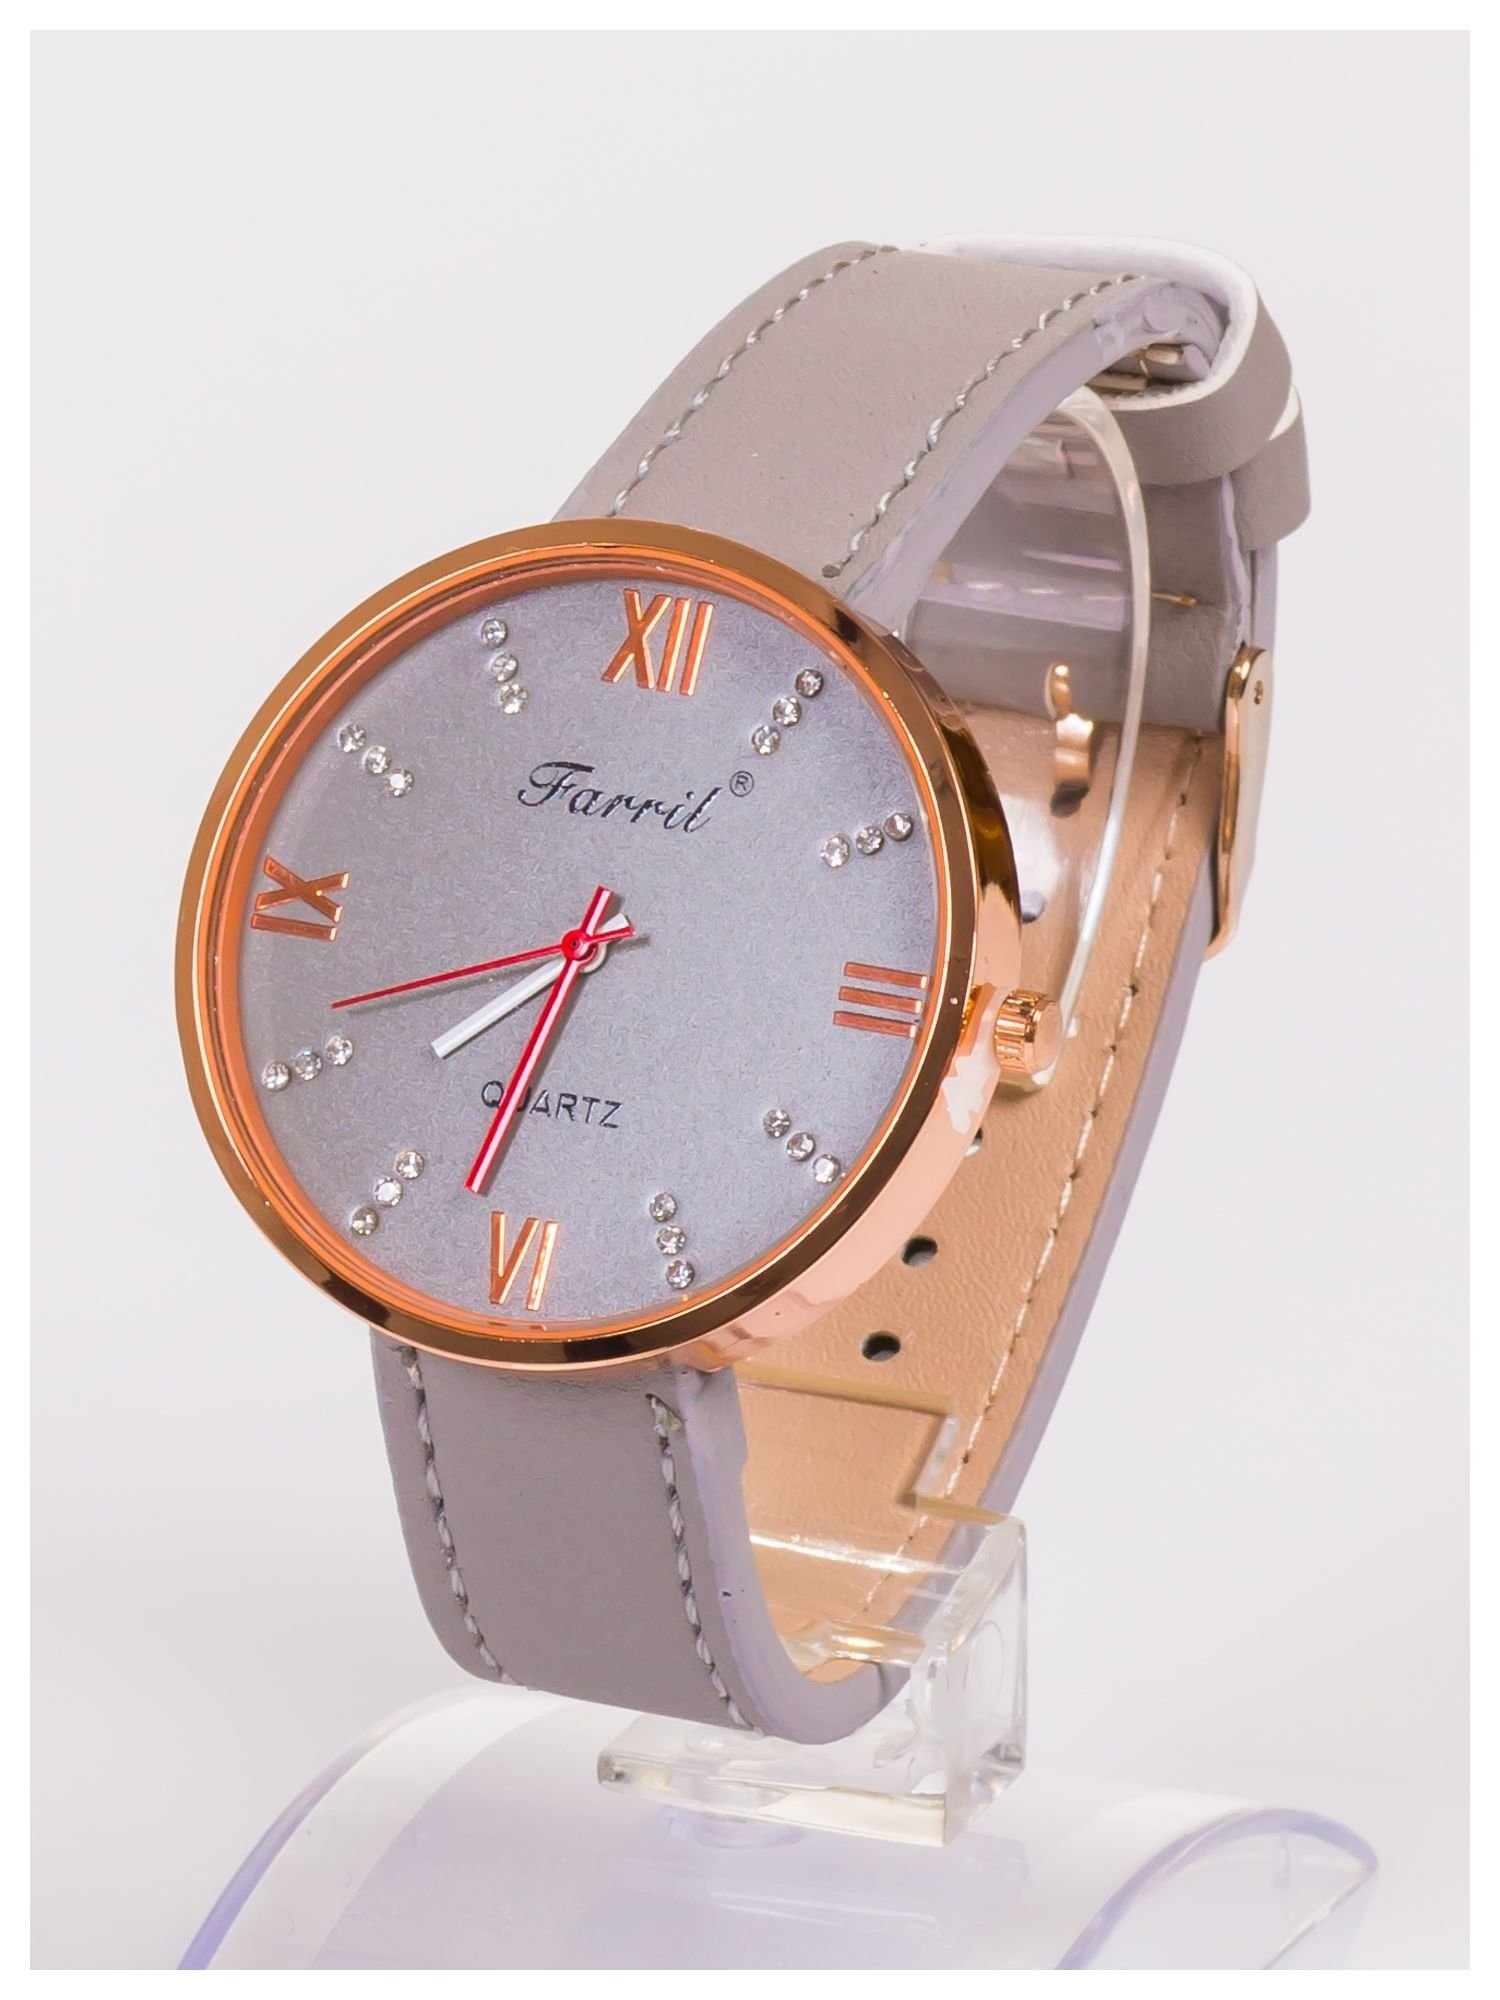 Farril -Klasyka i elegancja szary damski zegarek retro z cyrkoniami -Rose gold                                  zdj.                                  2